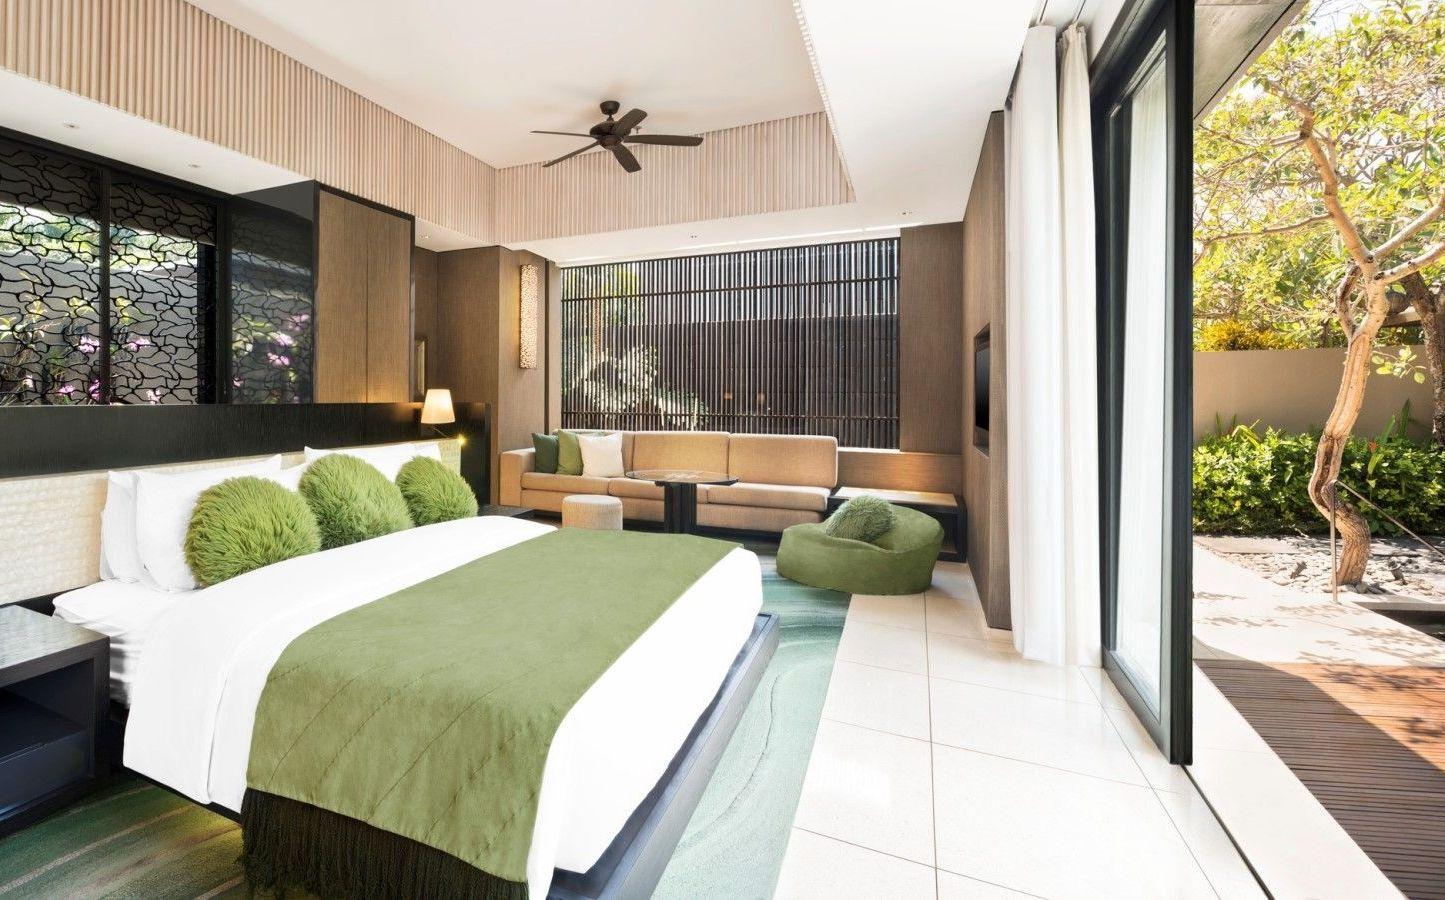 Bali 1 Bedroom Villa Accommodation  Www